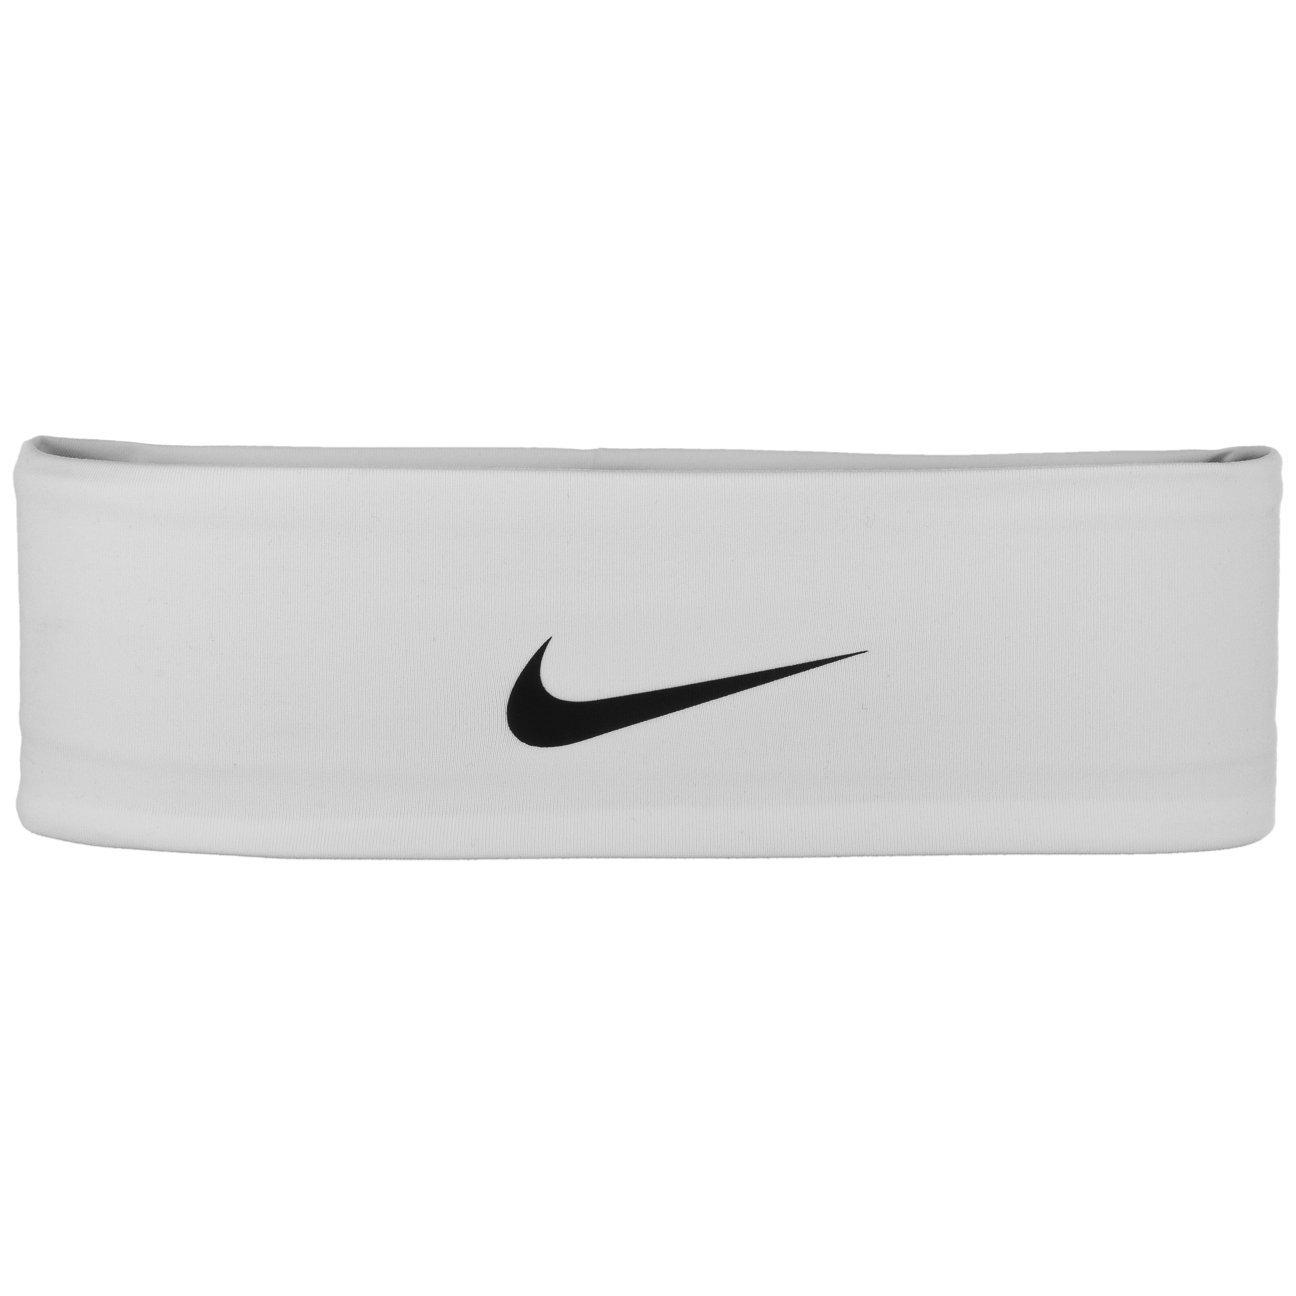 Nike Fury Headbands Review